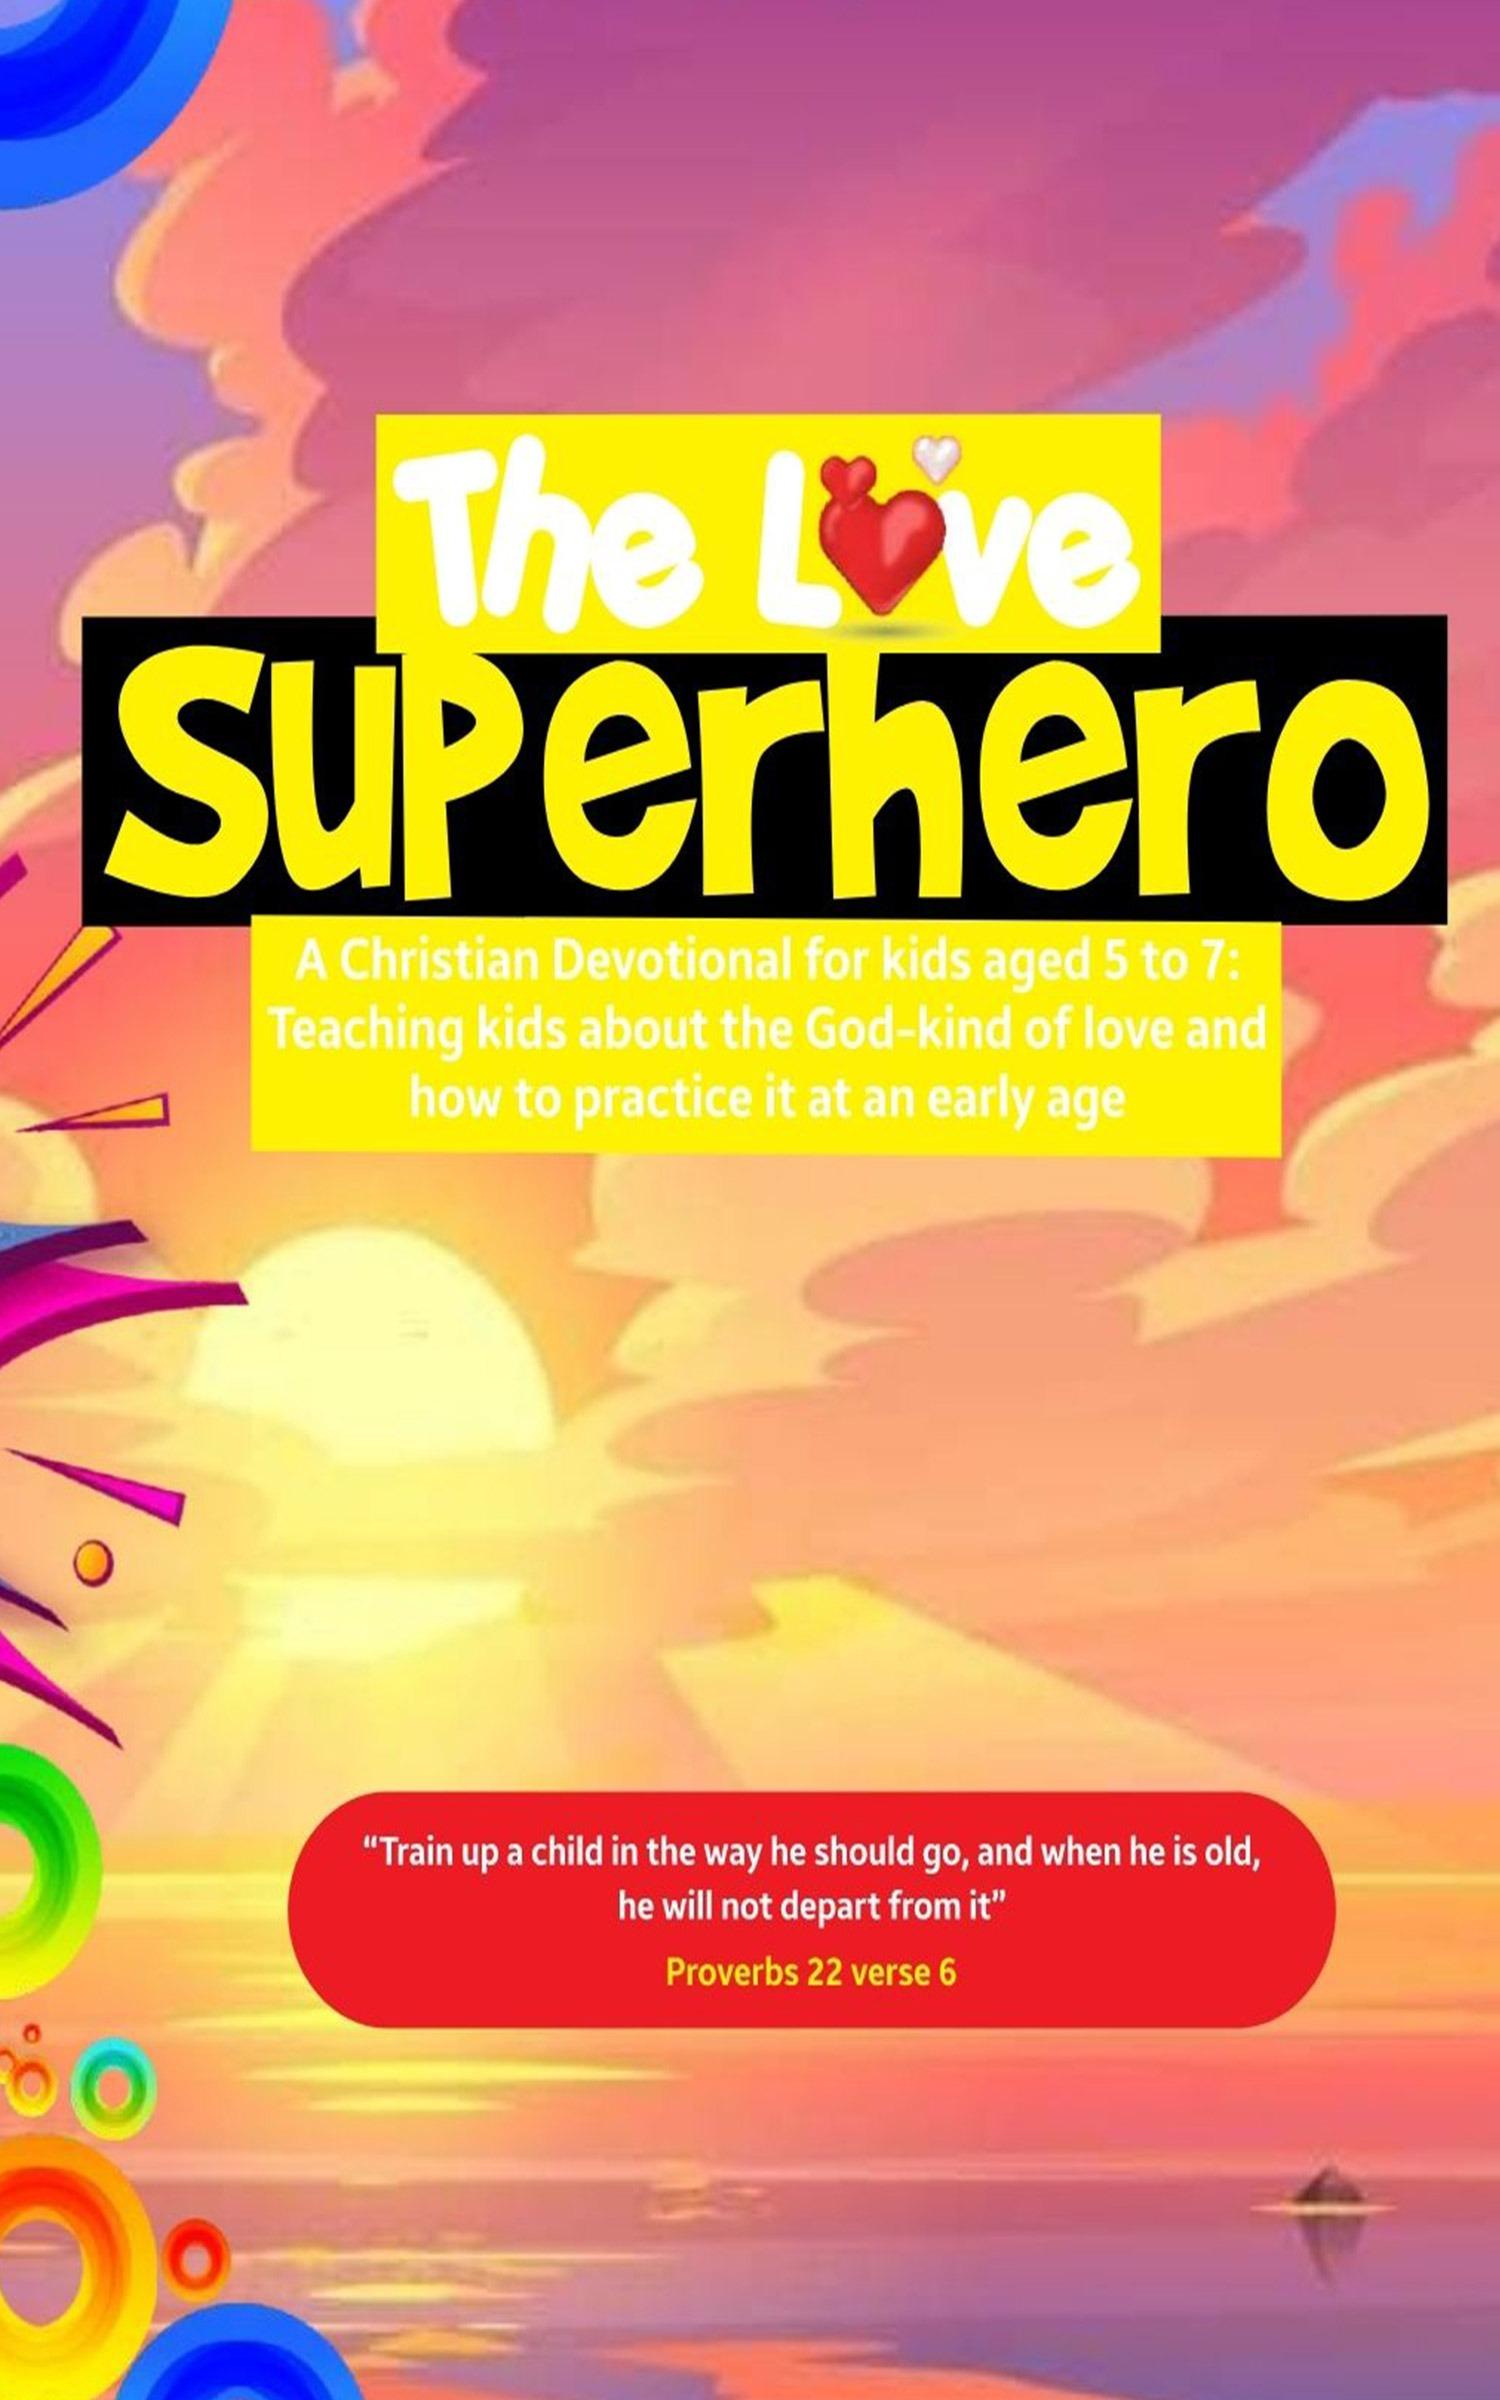 The Love Superhero